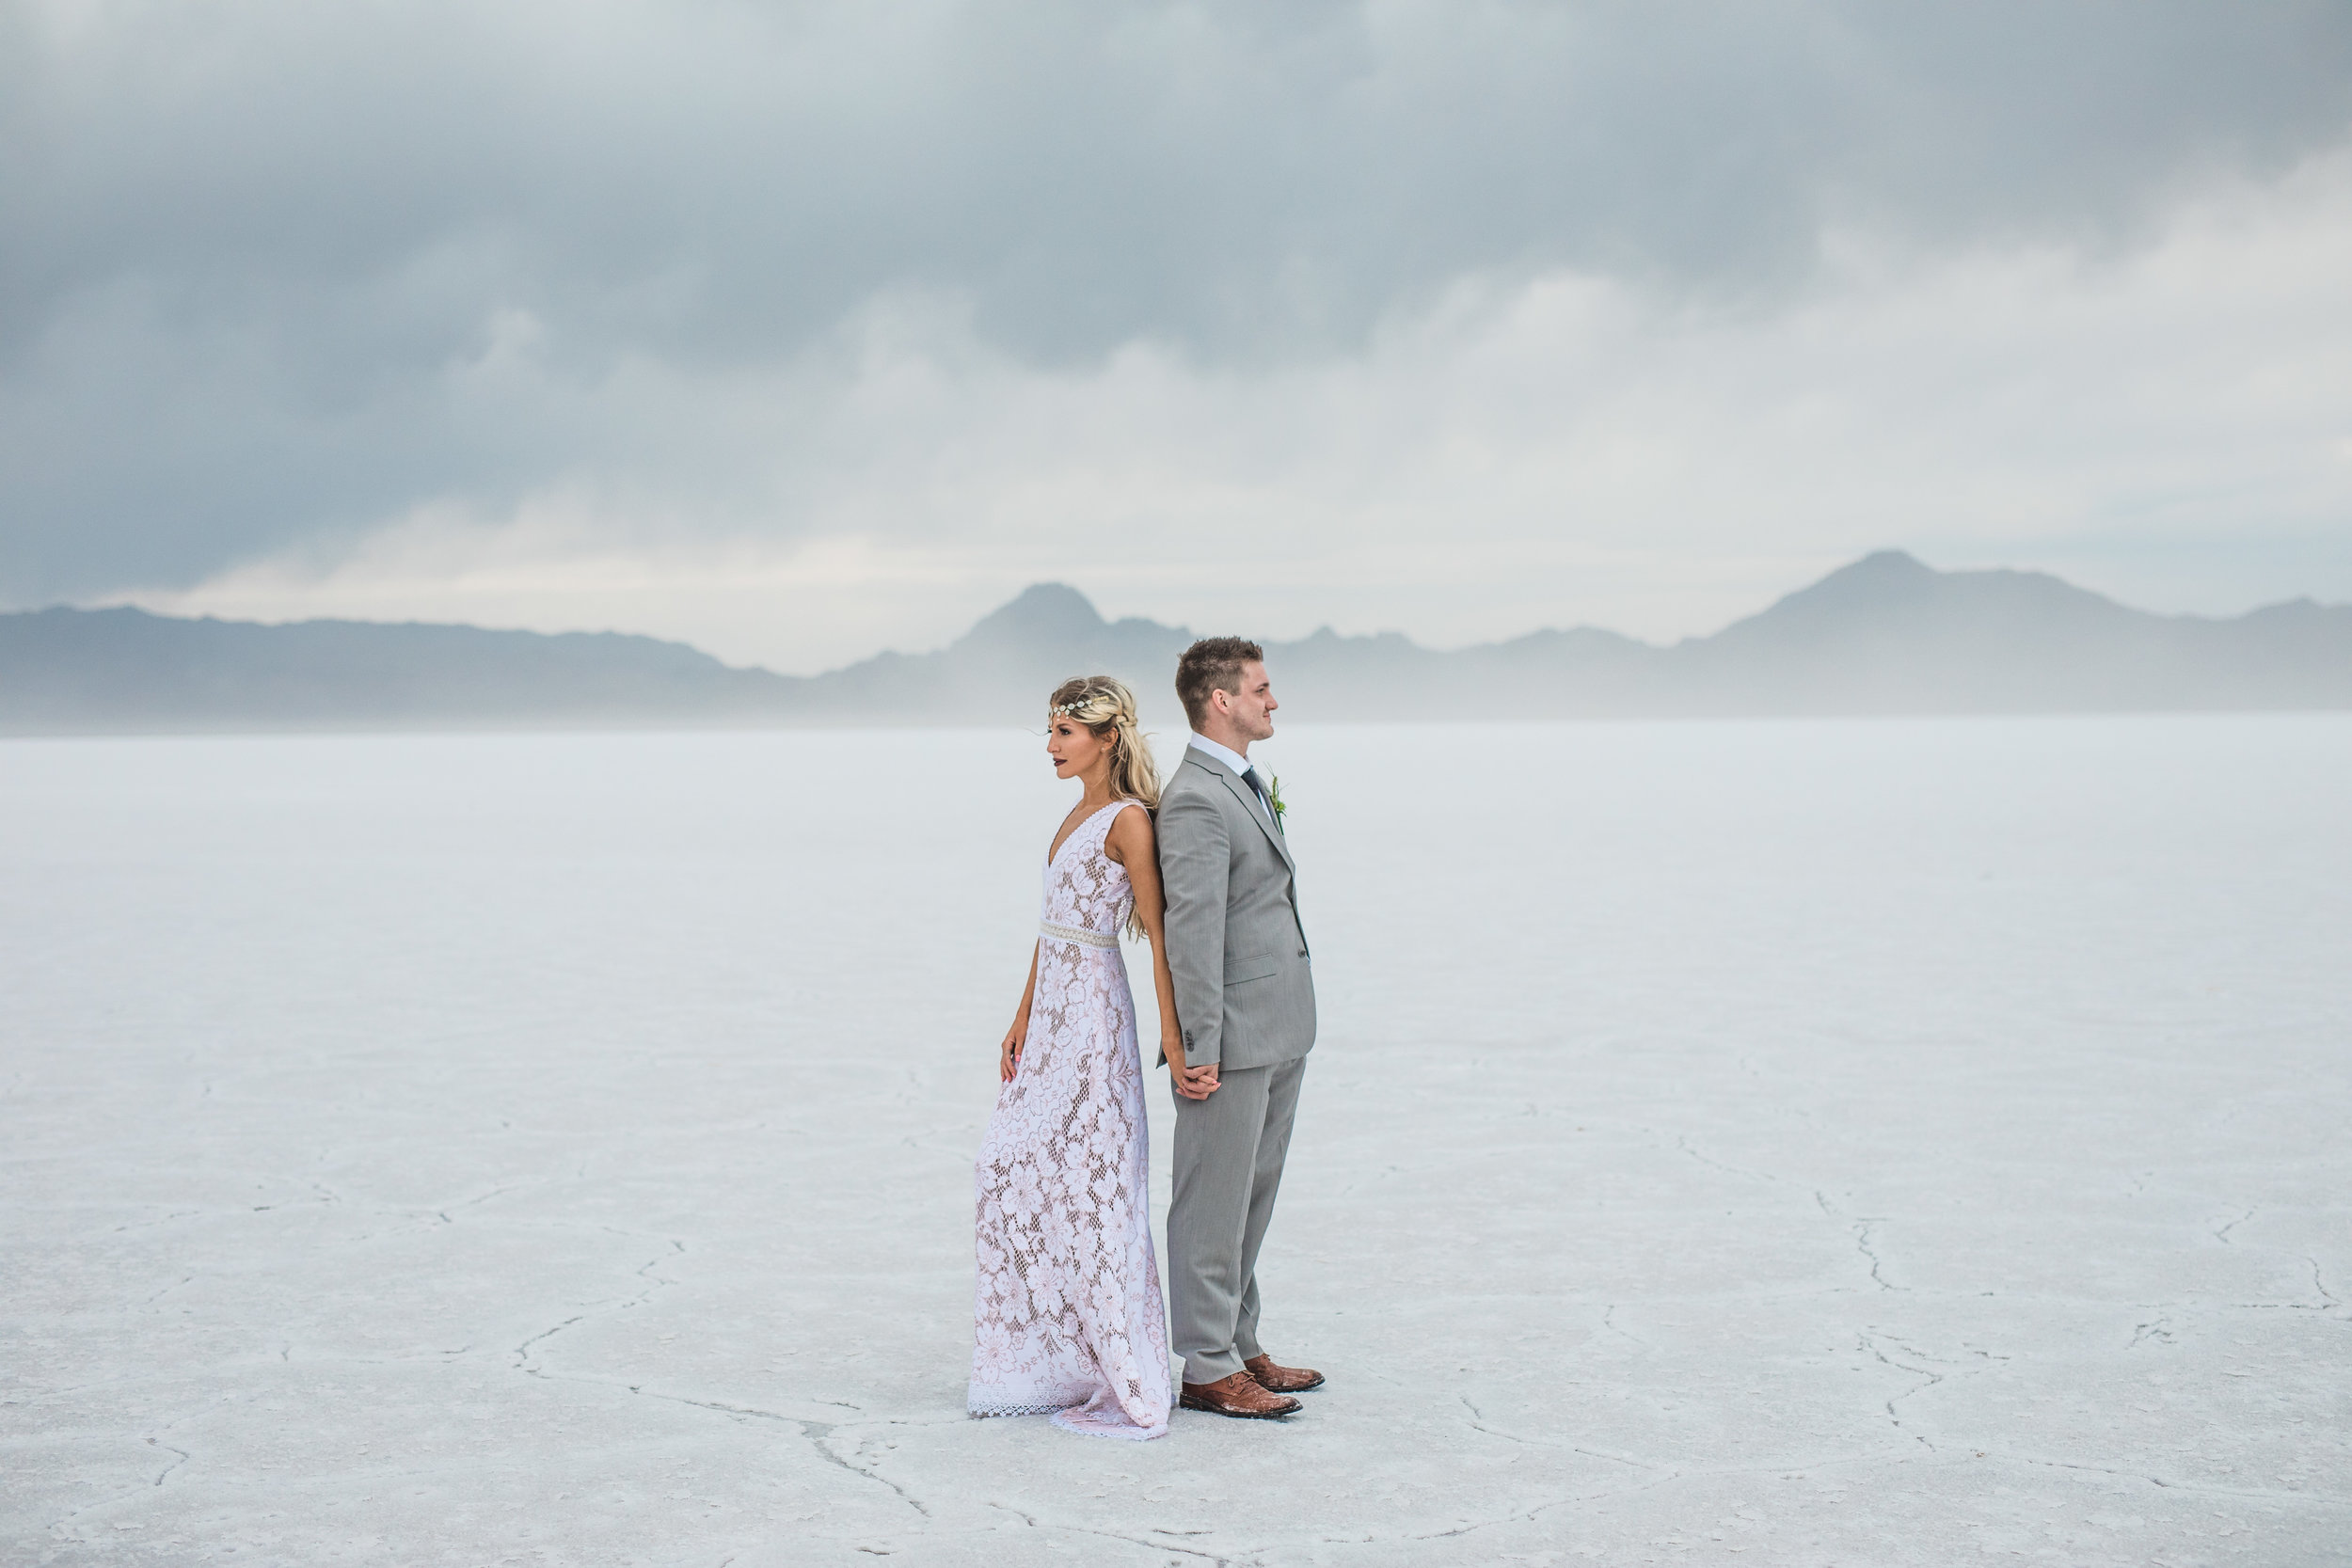 Epic fine art adventure wedding portraiture Kyle Loves Tori Photography